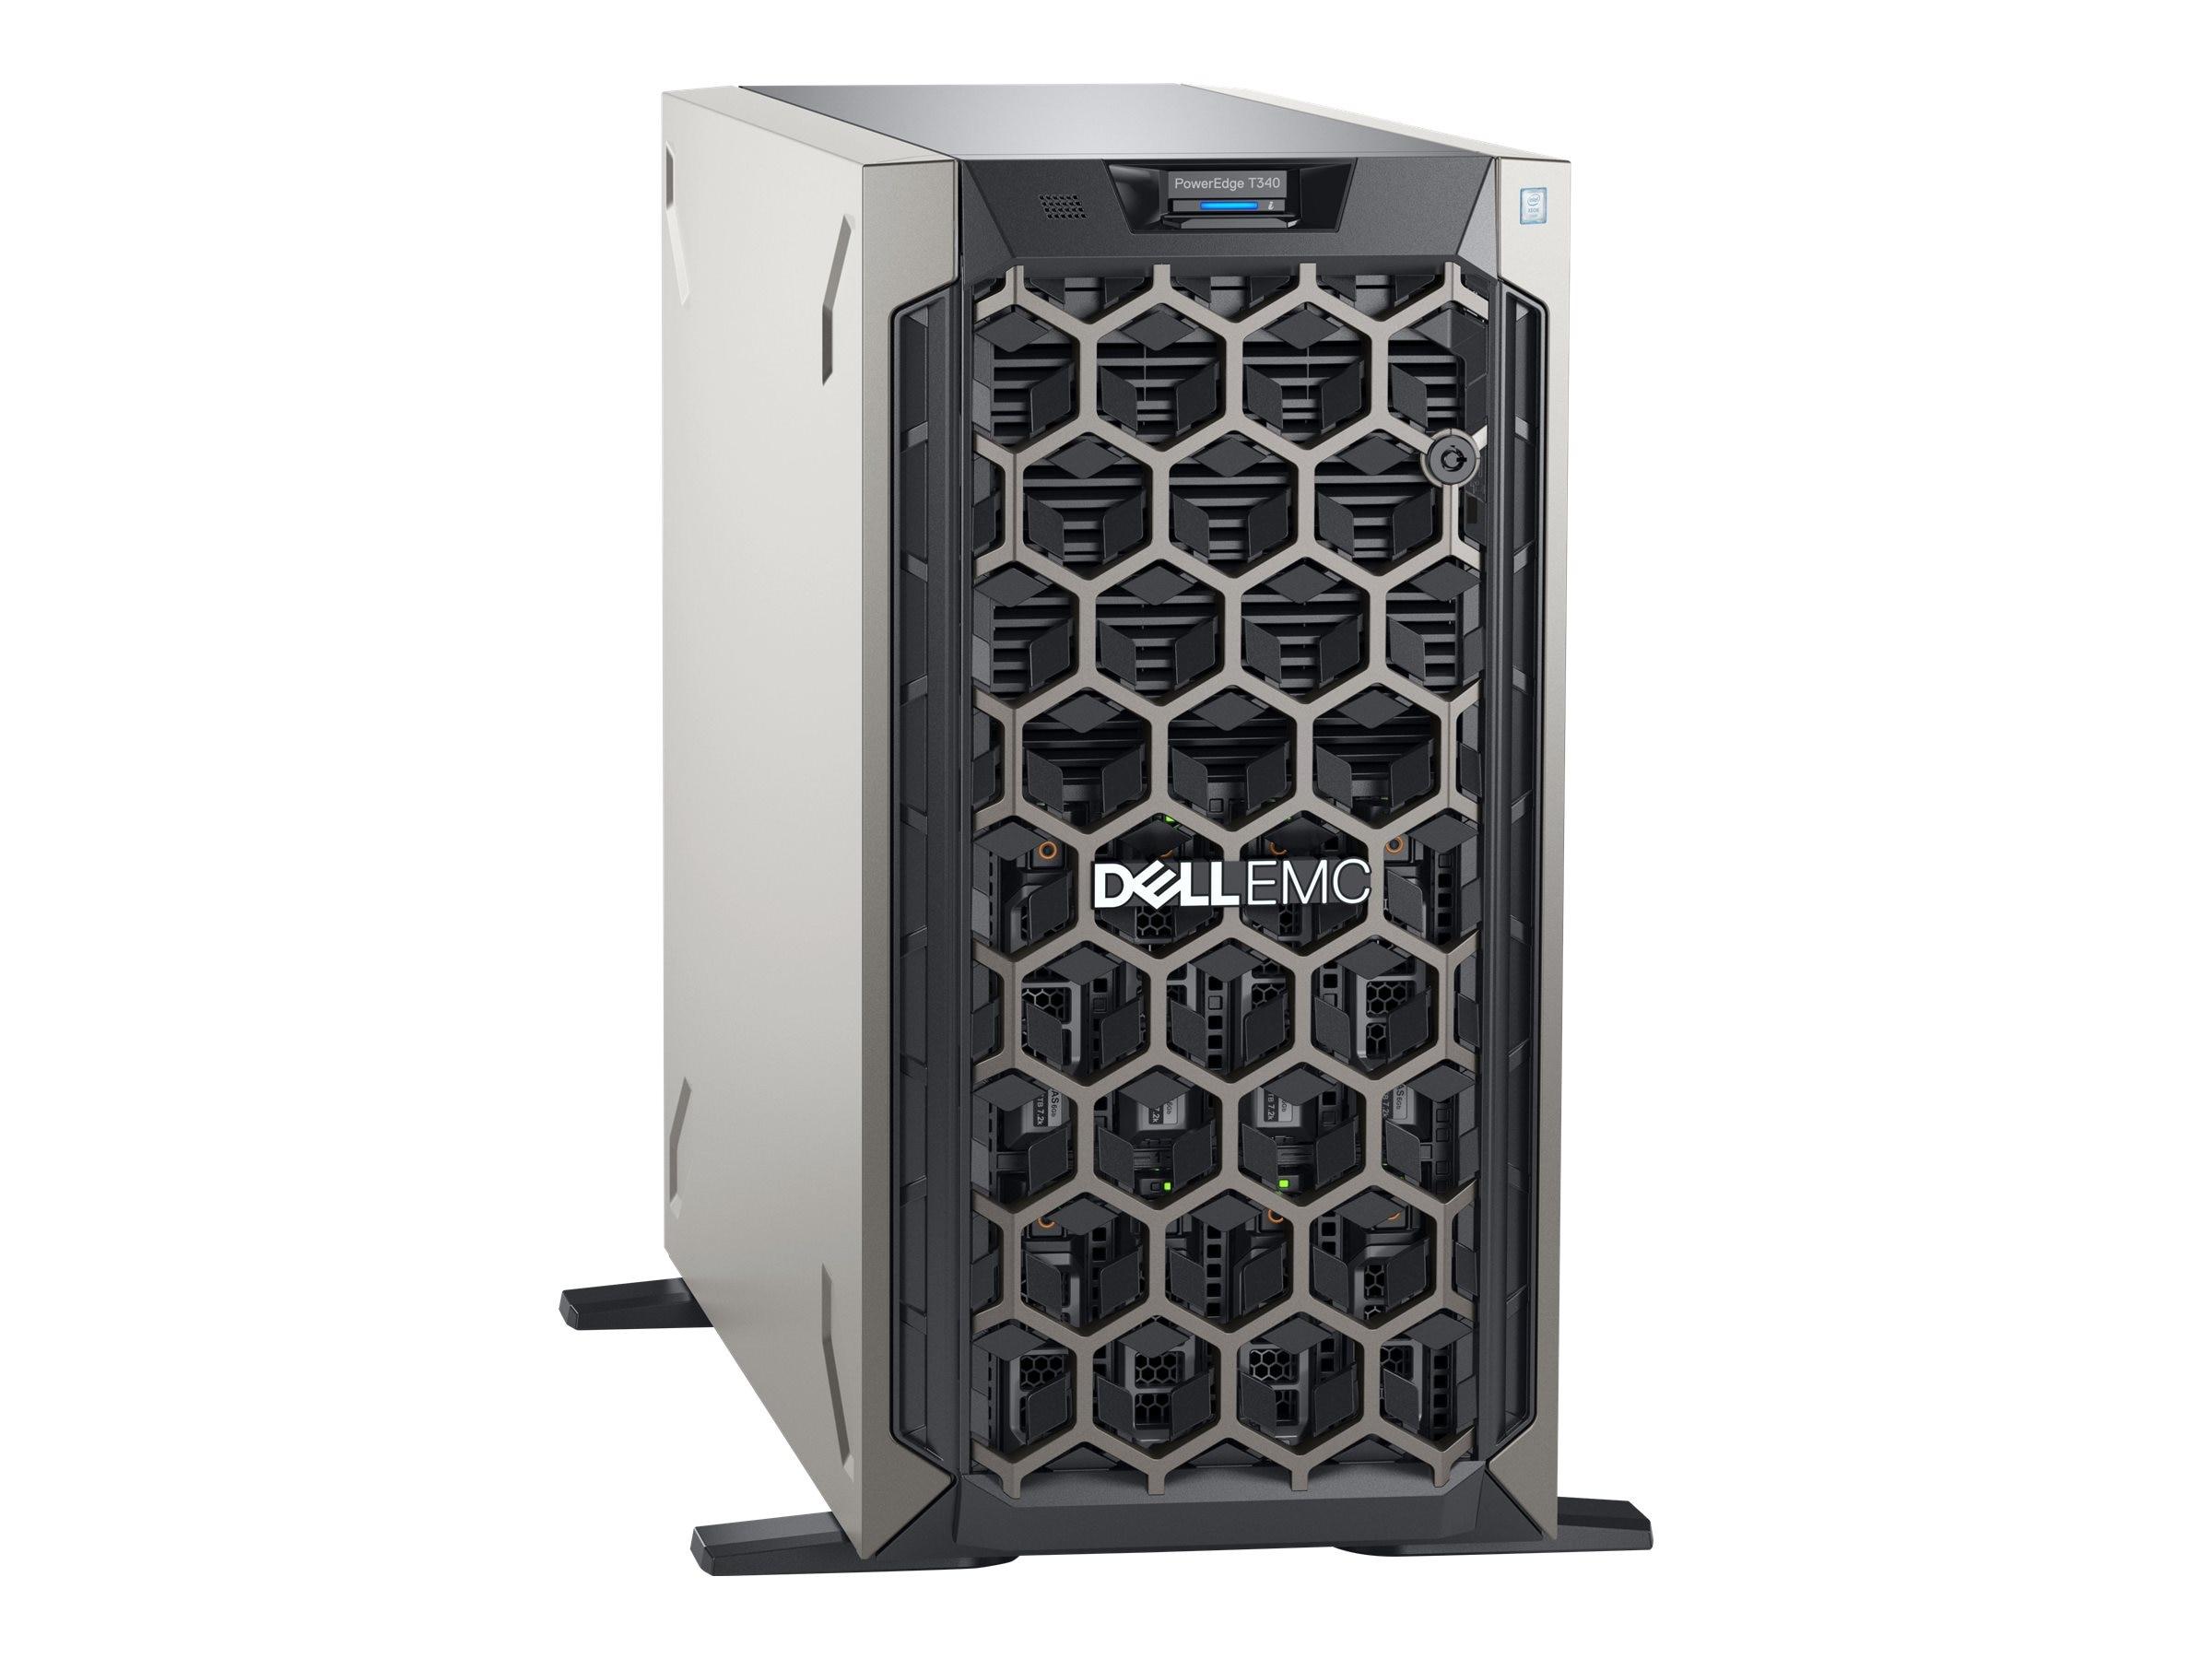 Dell PowerEdge T340 Tower Xeon QC E-2134 3 5GHz 8GB 1TB 8x3 5